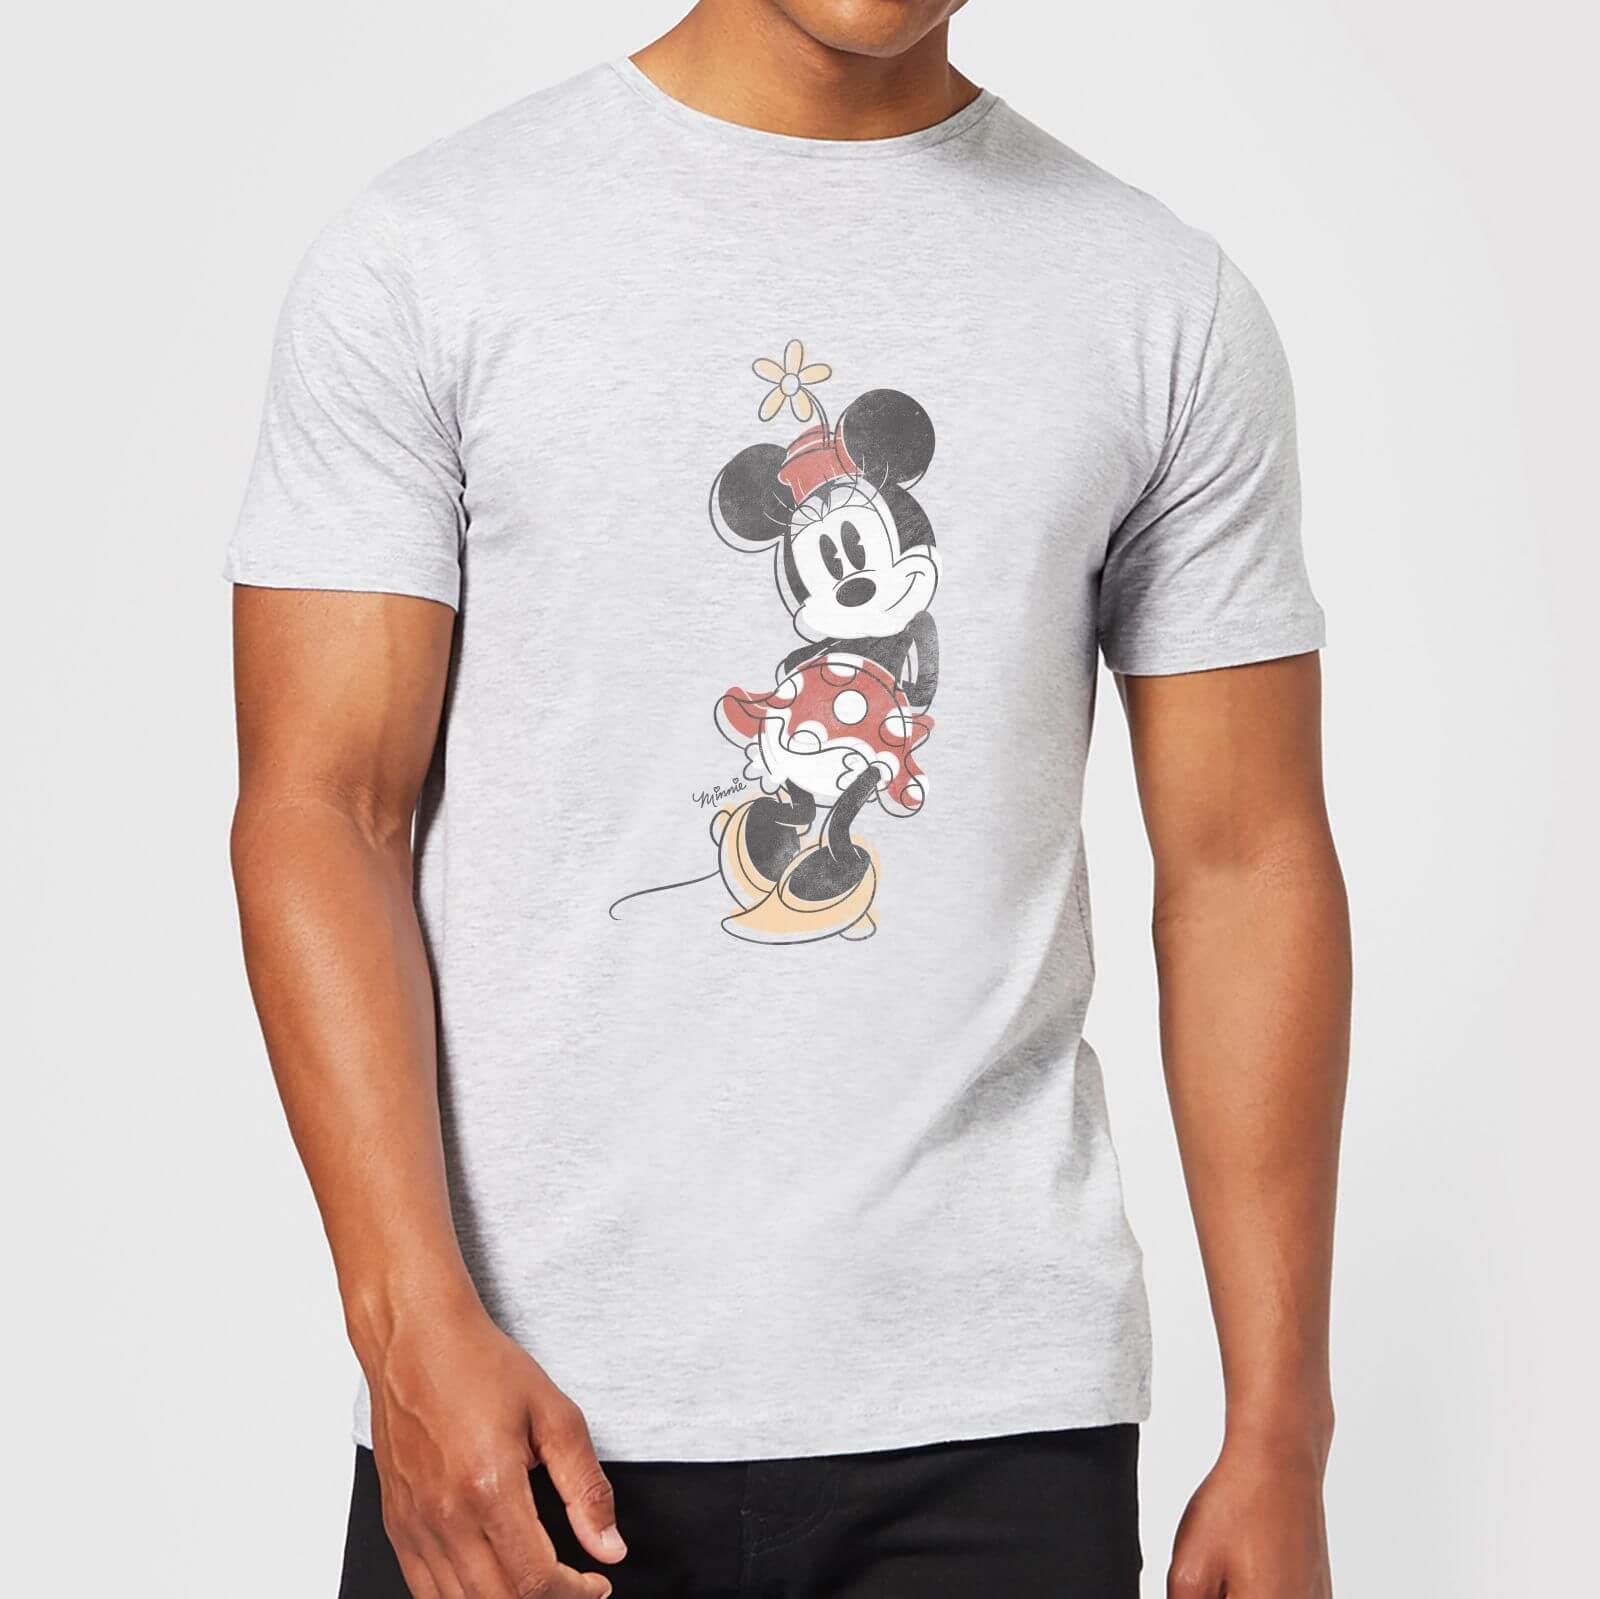 Disney Disney Mickey Mouse Minnie Offset T-Shirt - Grey - 4XL - Grey